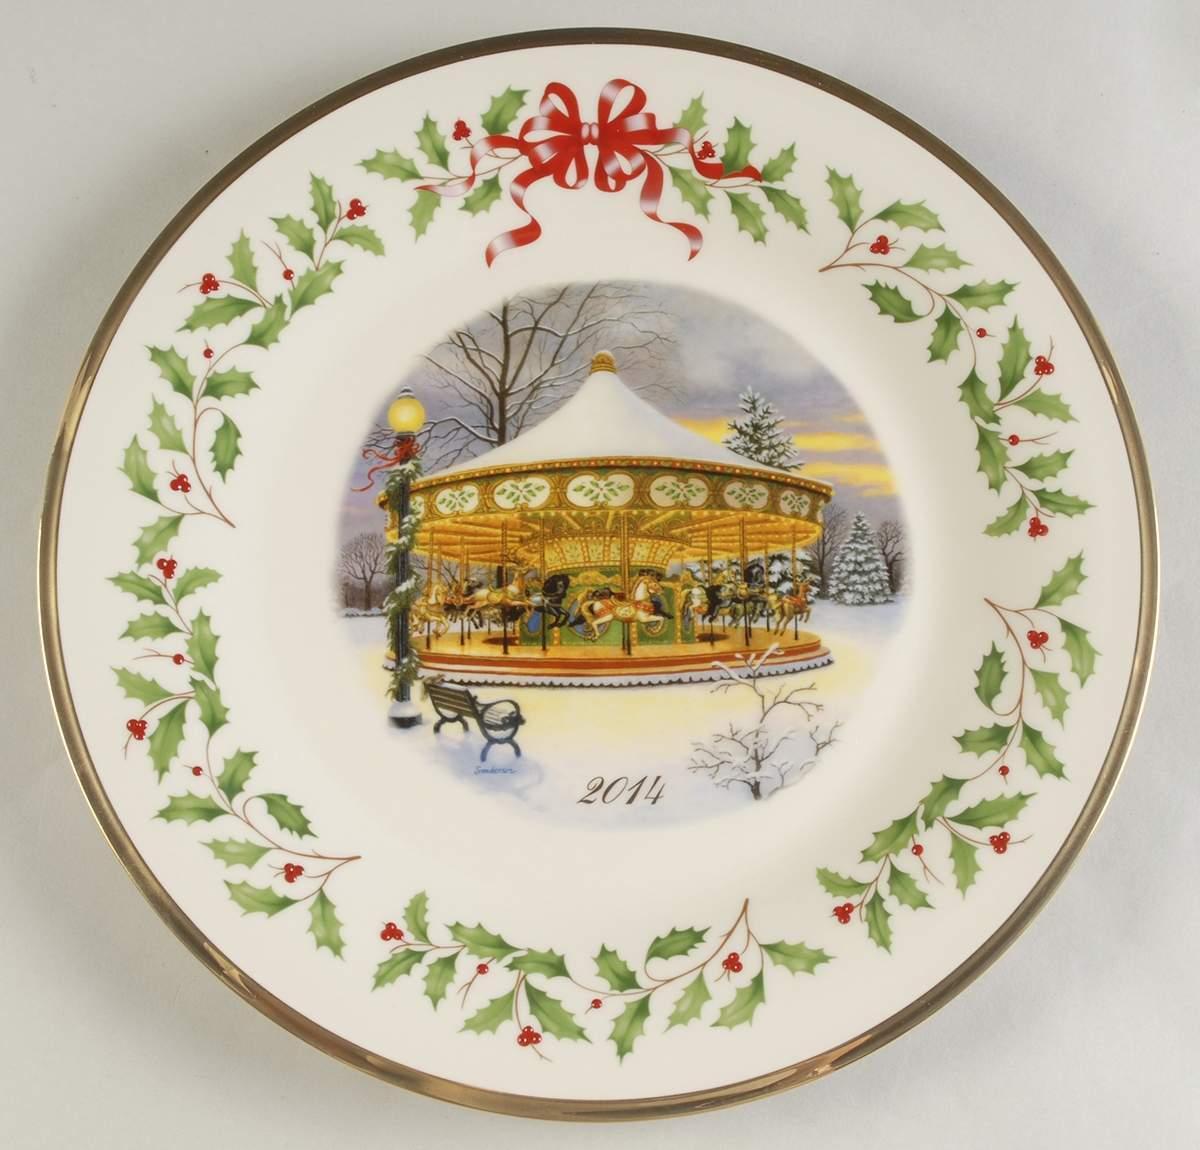 Neu in Geschenkschachtel 2014 Lenox Weihnachtskarussell Annual Collector Plate